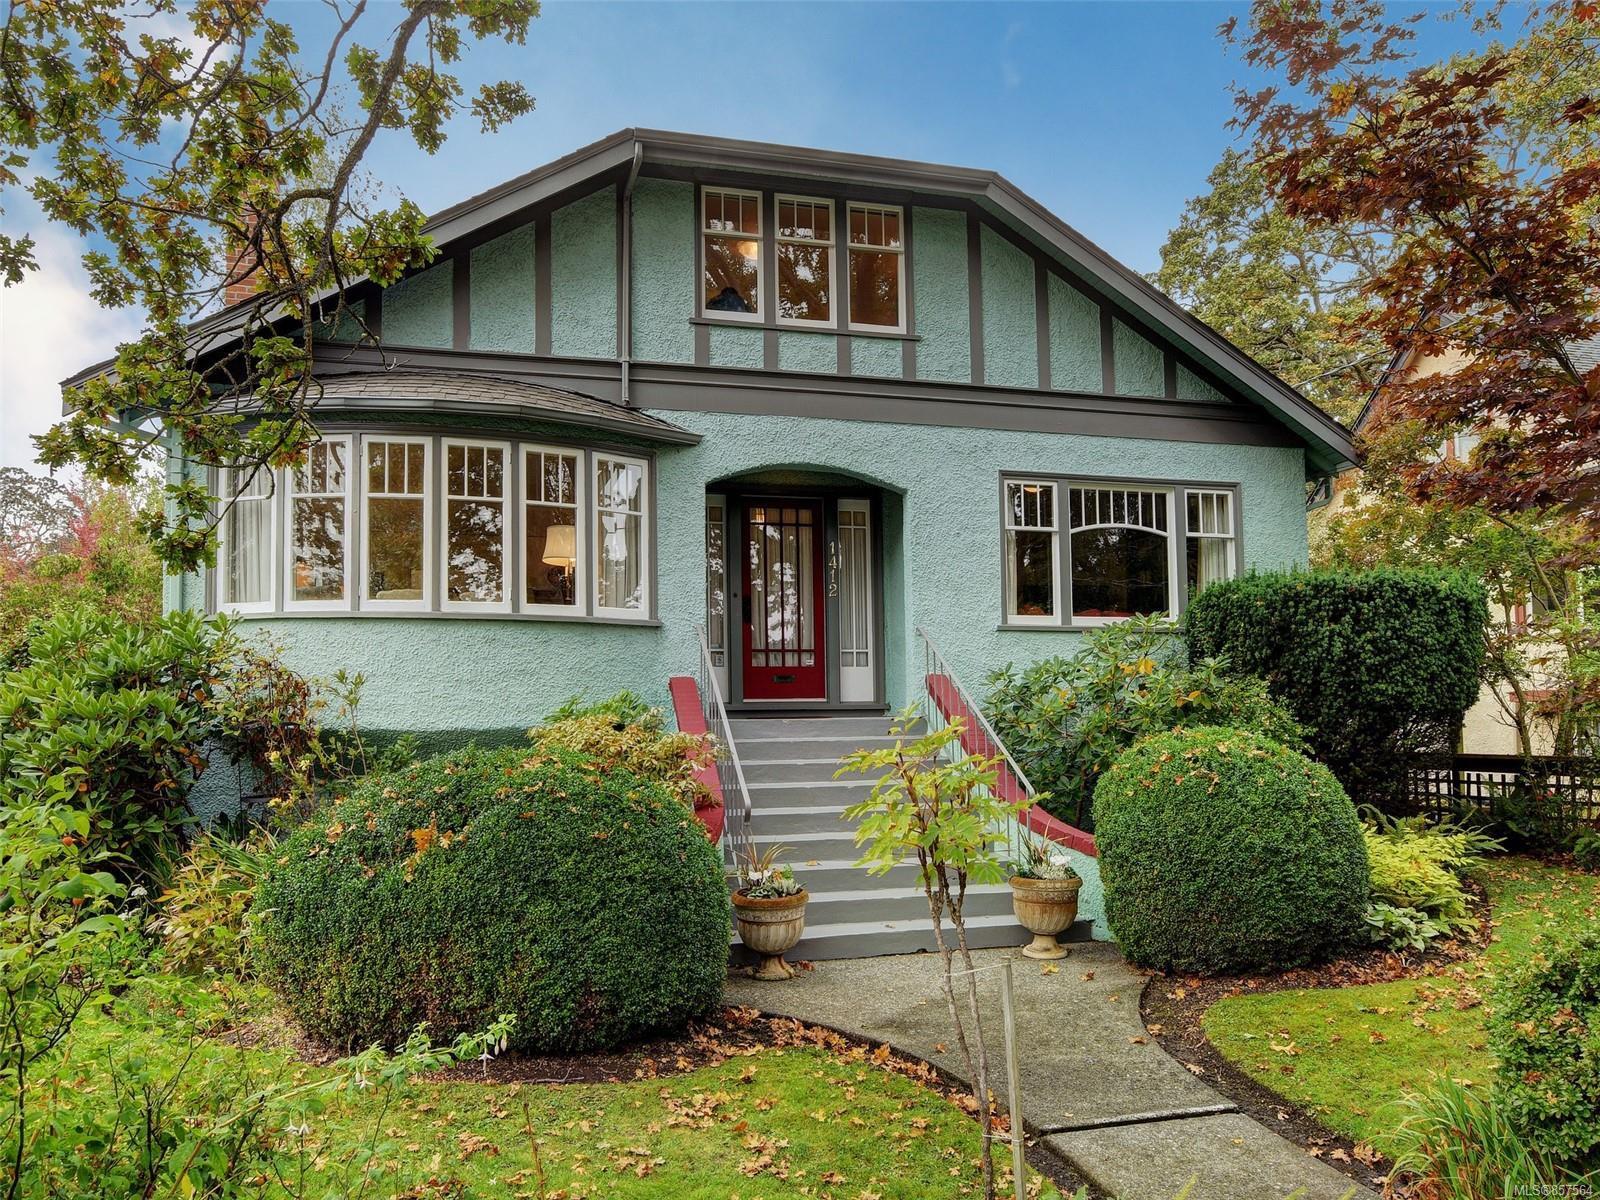 Main Photo: 1412 Oliver St in : OB South Oak Bay House for sale (Oak Bay)  : MLS®# 857564